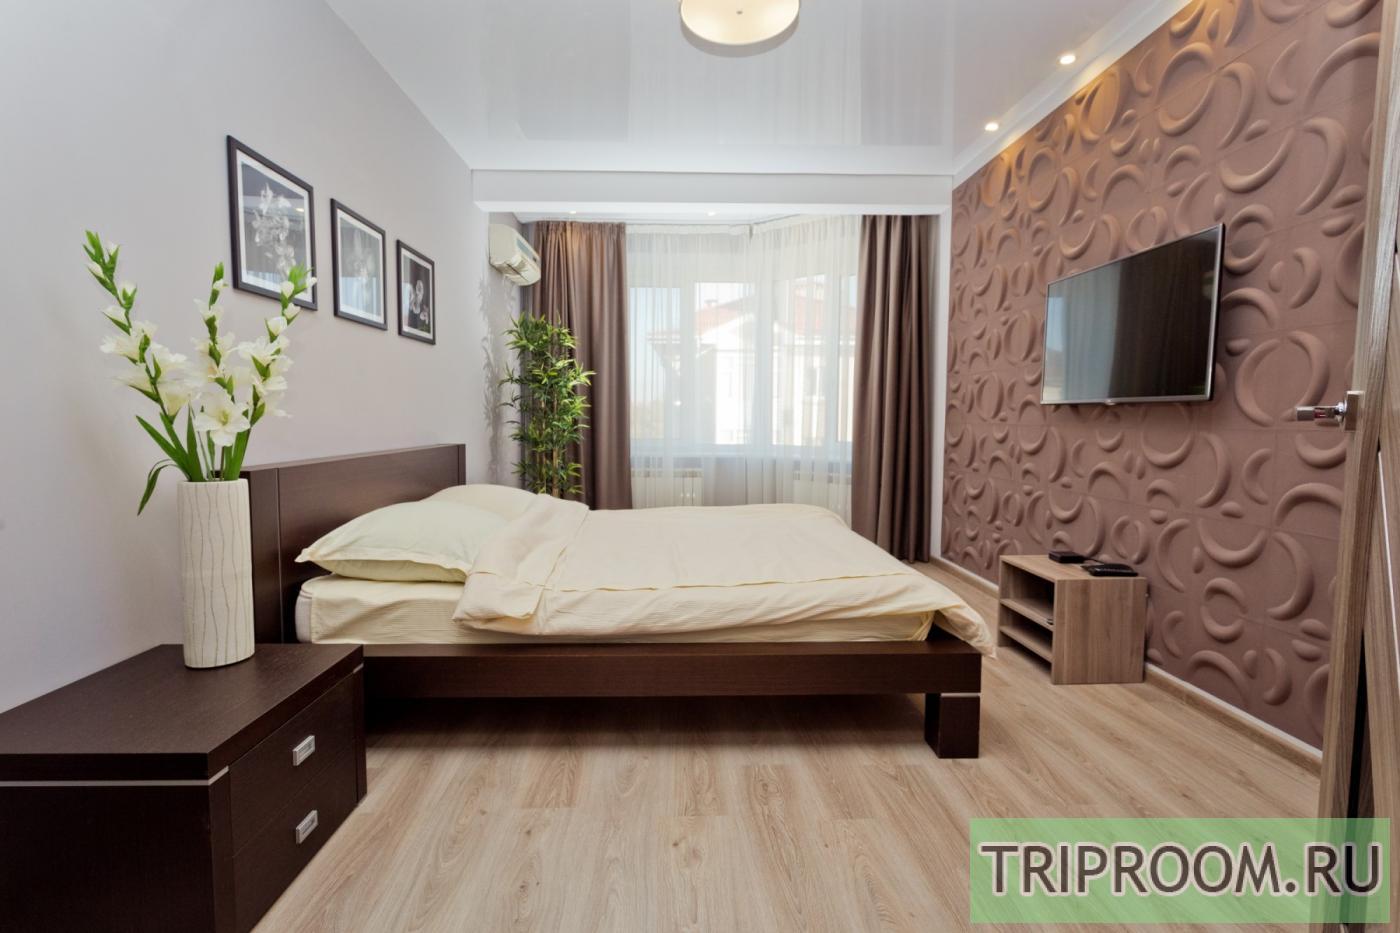 2-комнатная квартира посуточно (вариант № 26145), ул. Звездинка улица, фото № 1